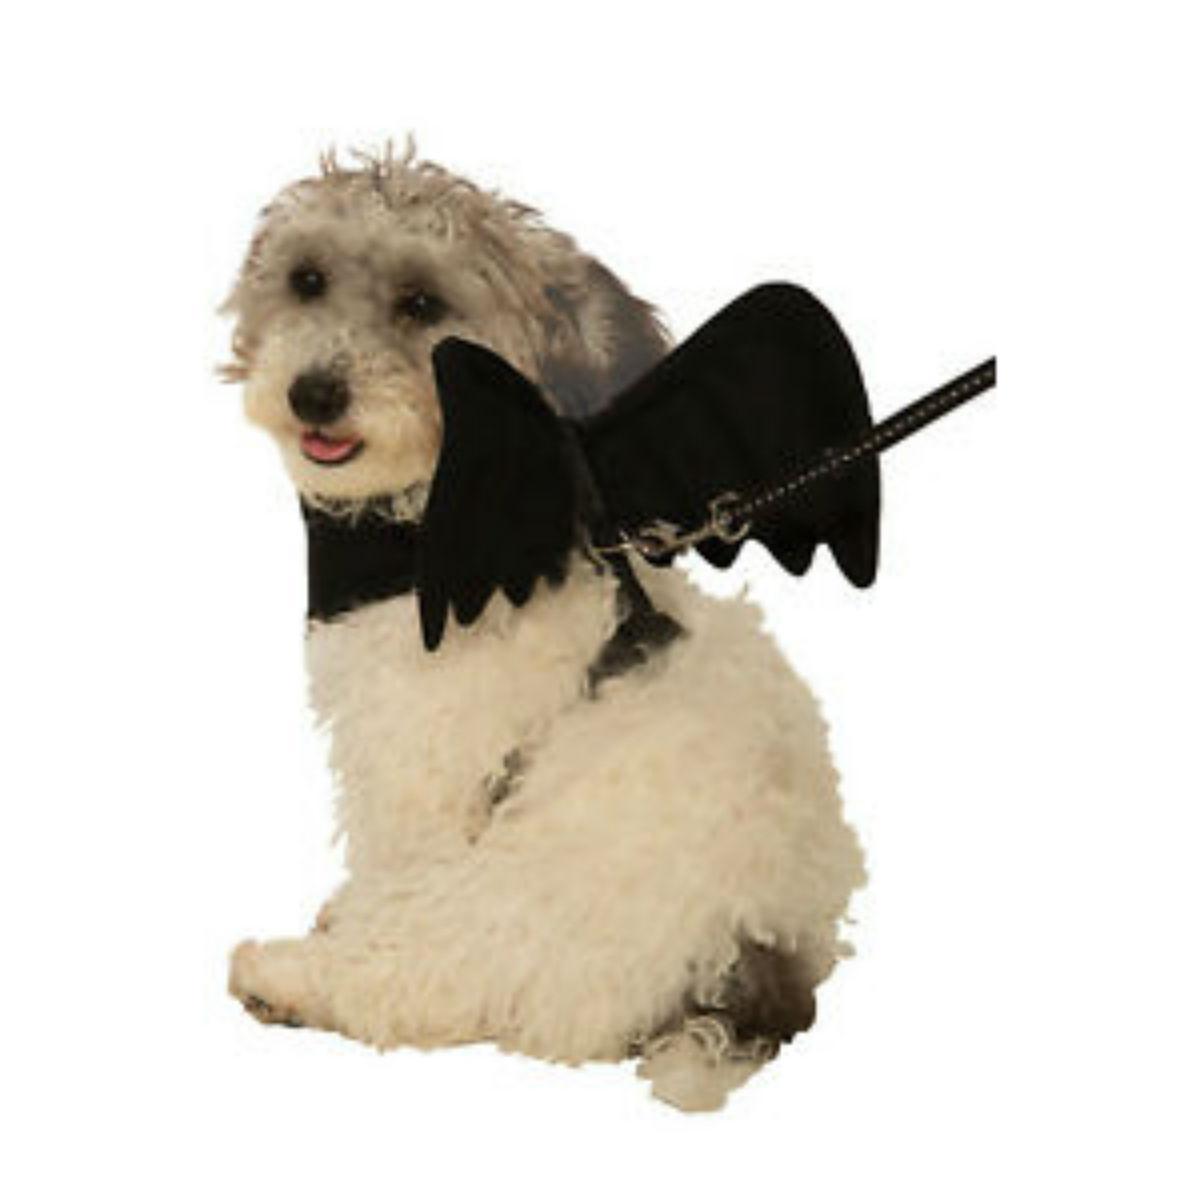 Bat Wing Dog Harness Costume - Black